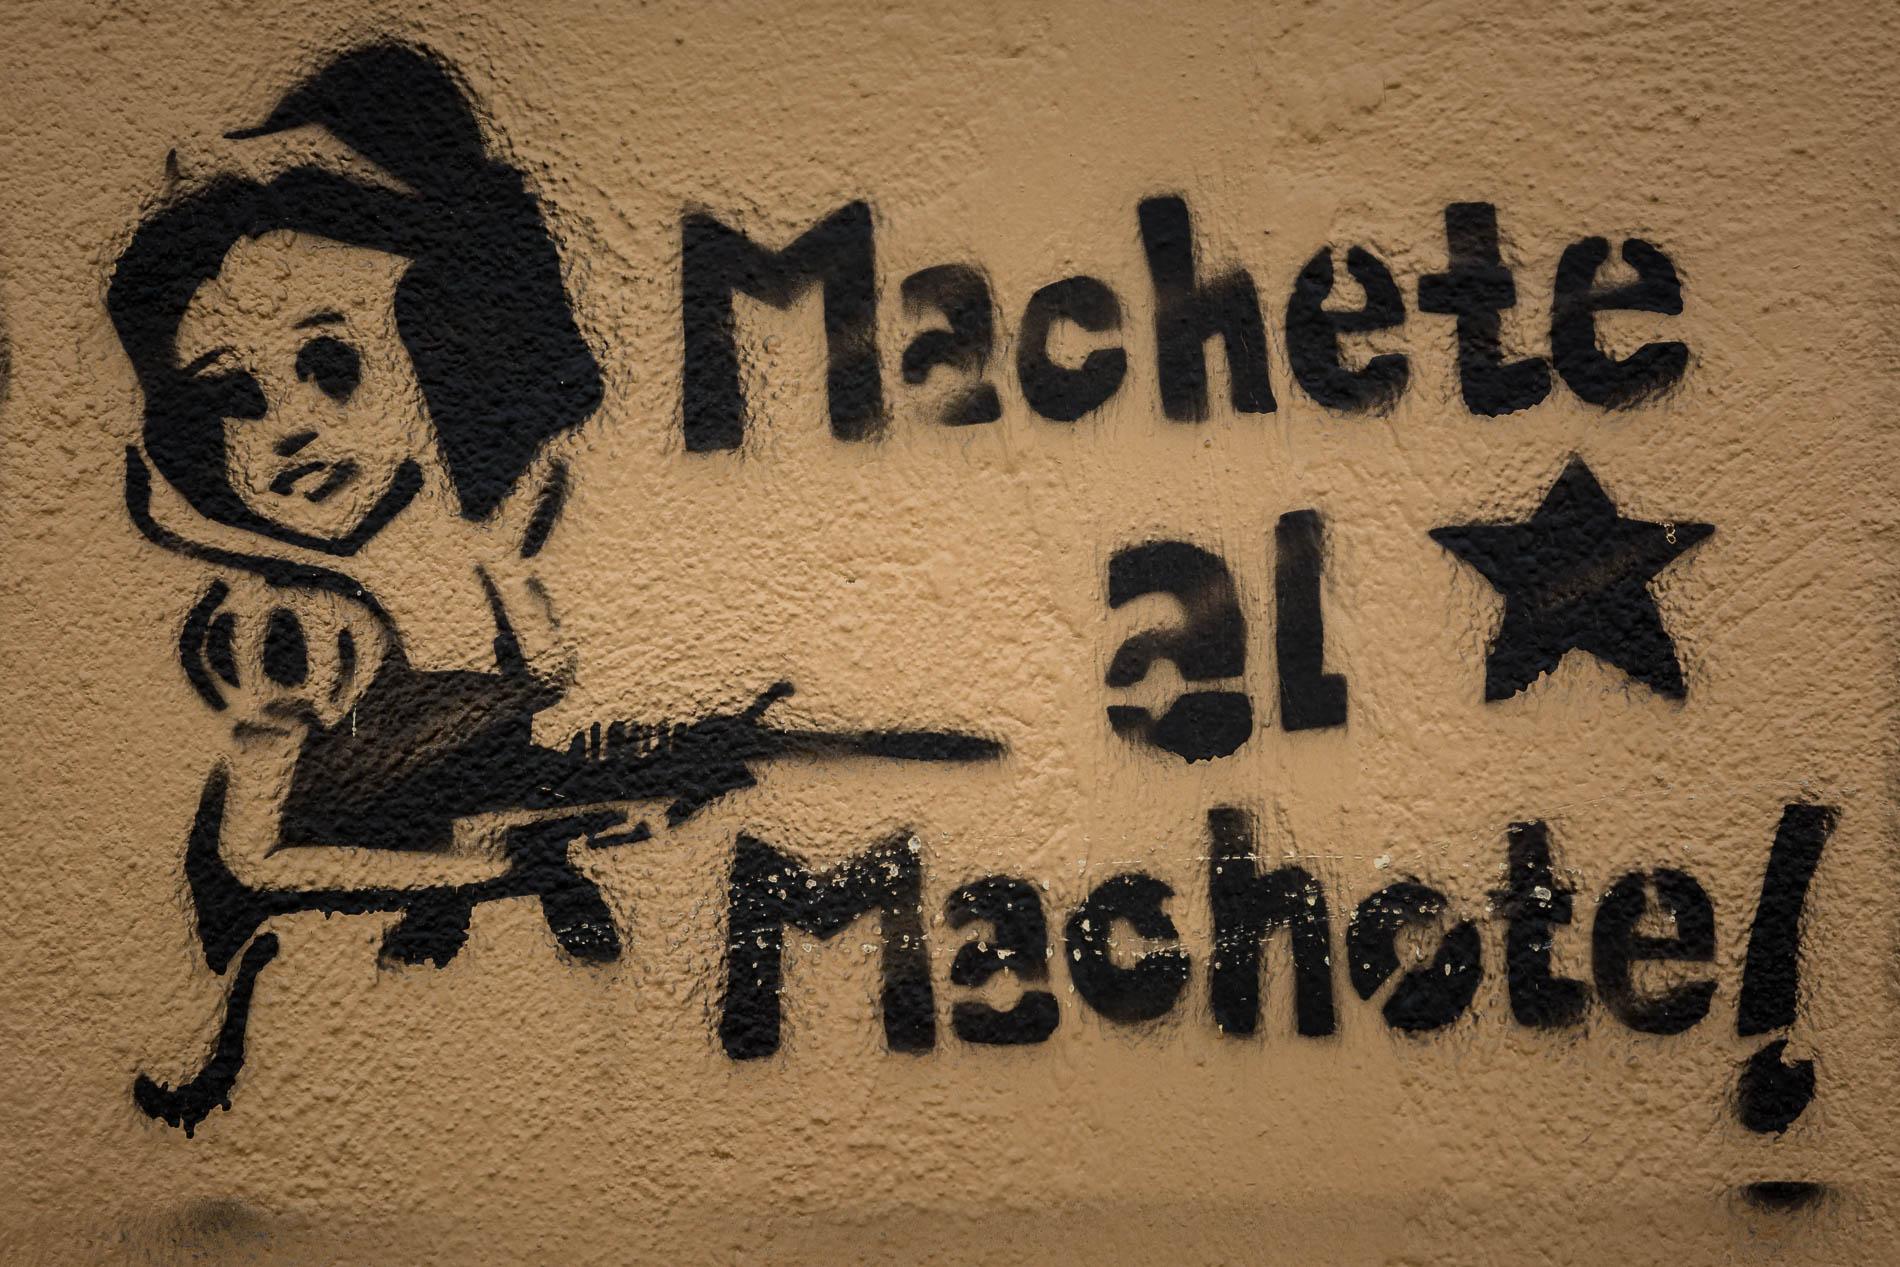 Anti-Machismo Graffiti in San Cristóbal de las Casas, Mexico